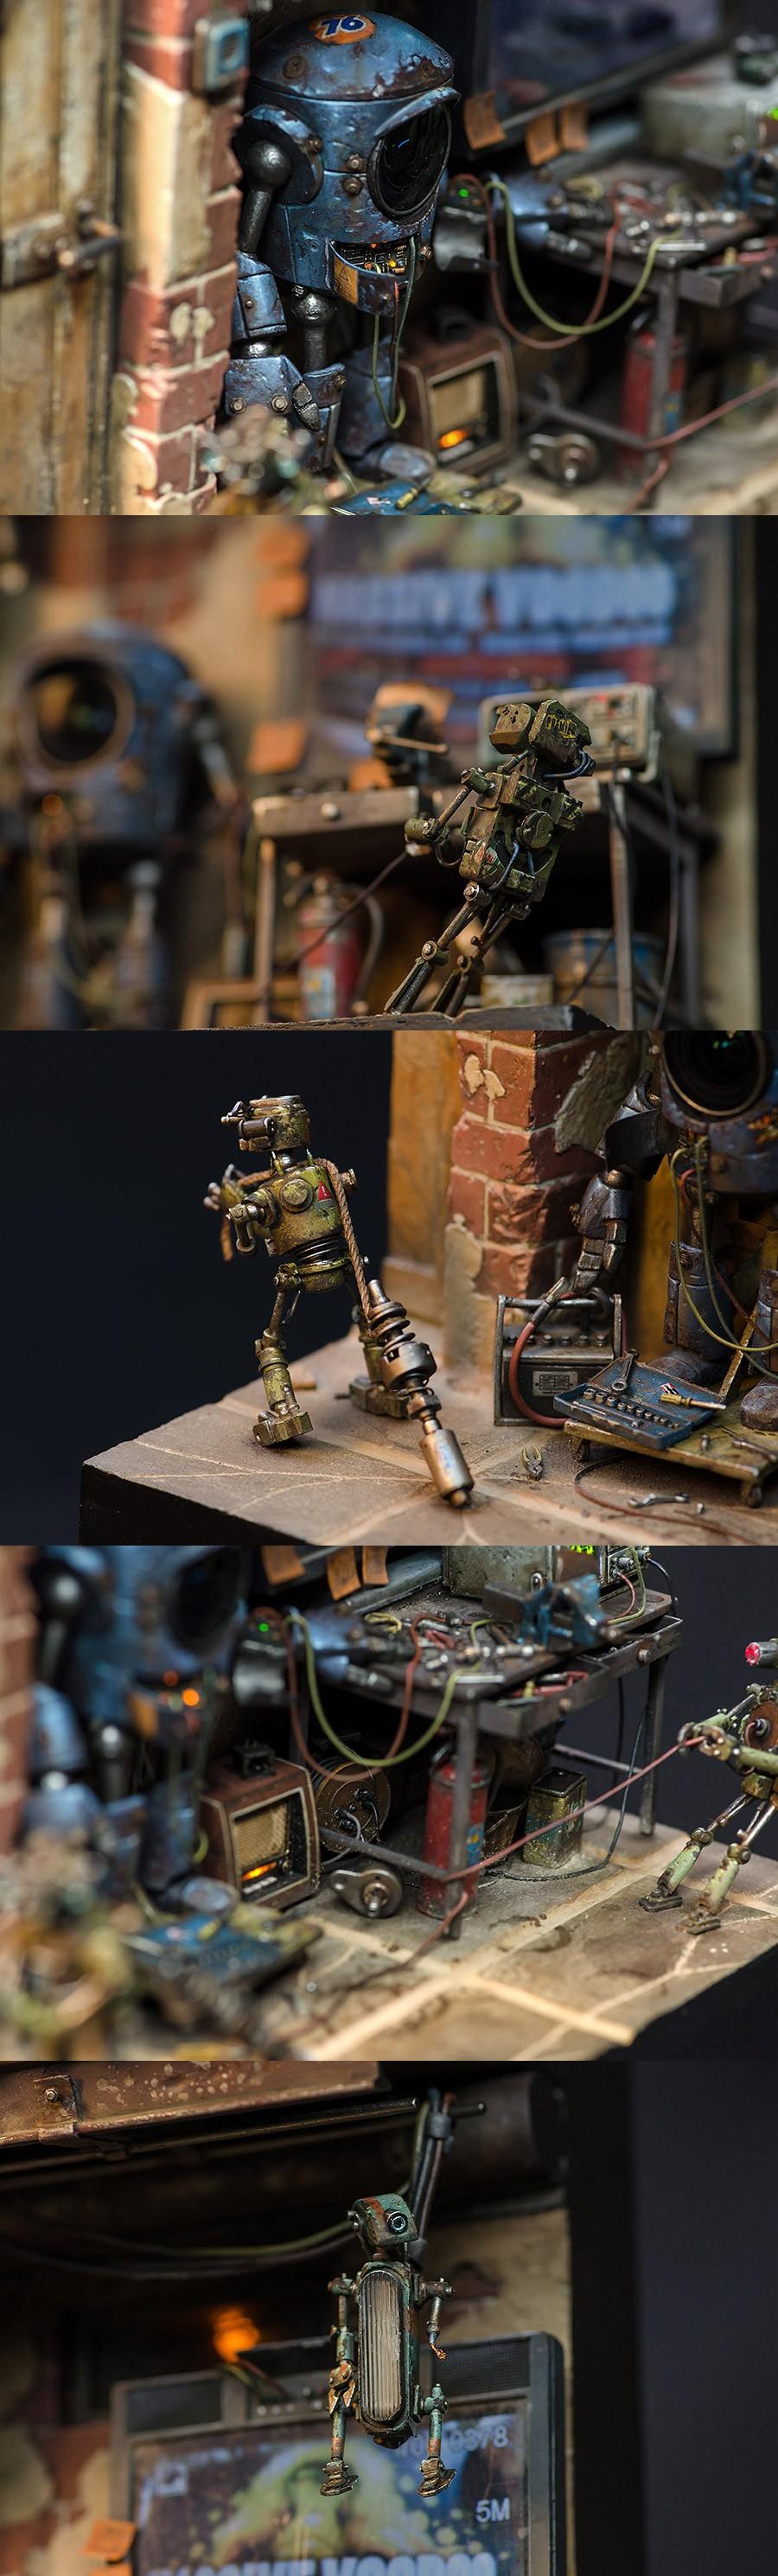 Giu's Robot Repairs - Part 2